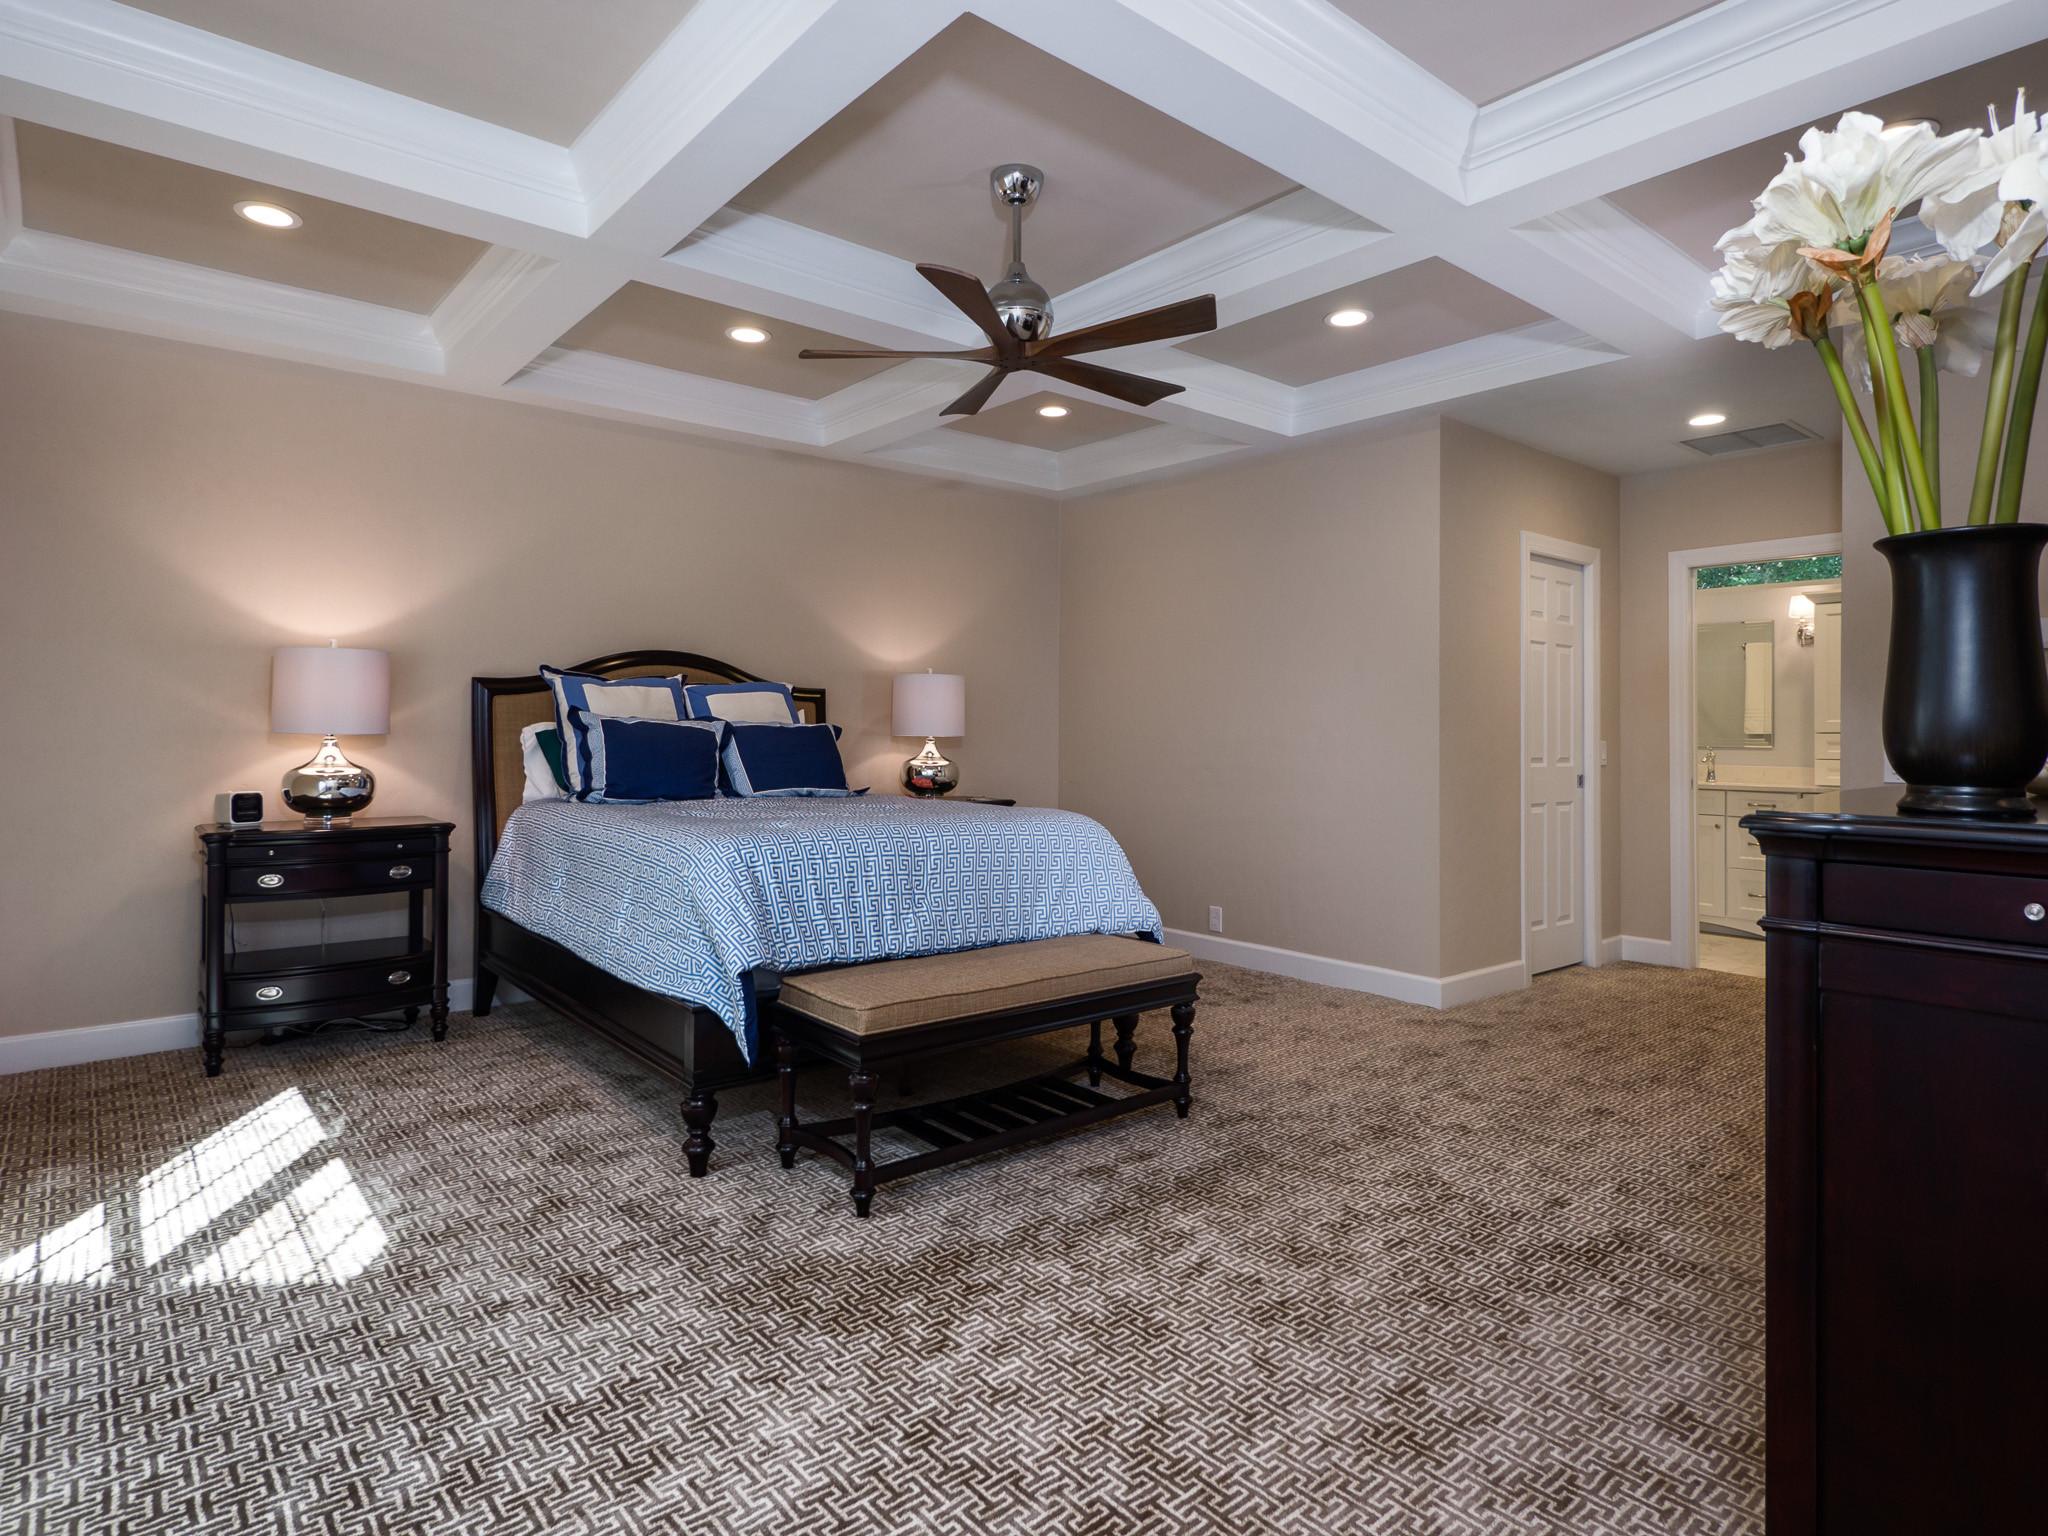 Oakmont - Haile Plantation Master Suite Renovation Gainesville, Florida